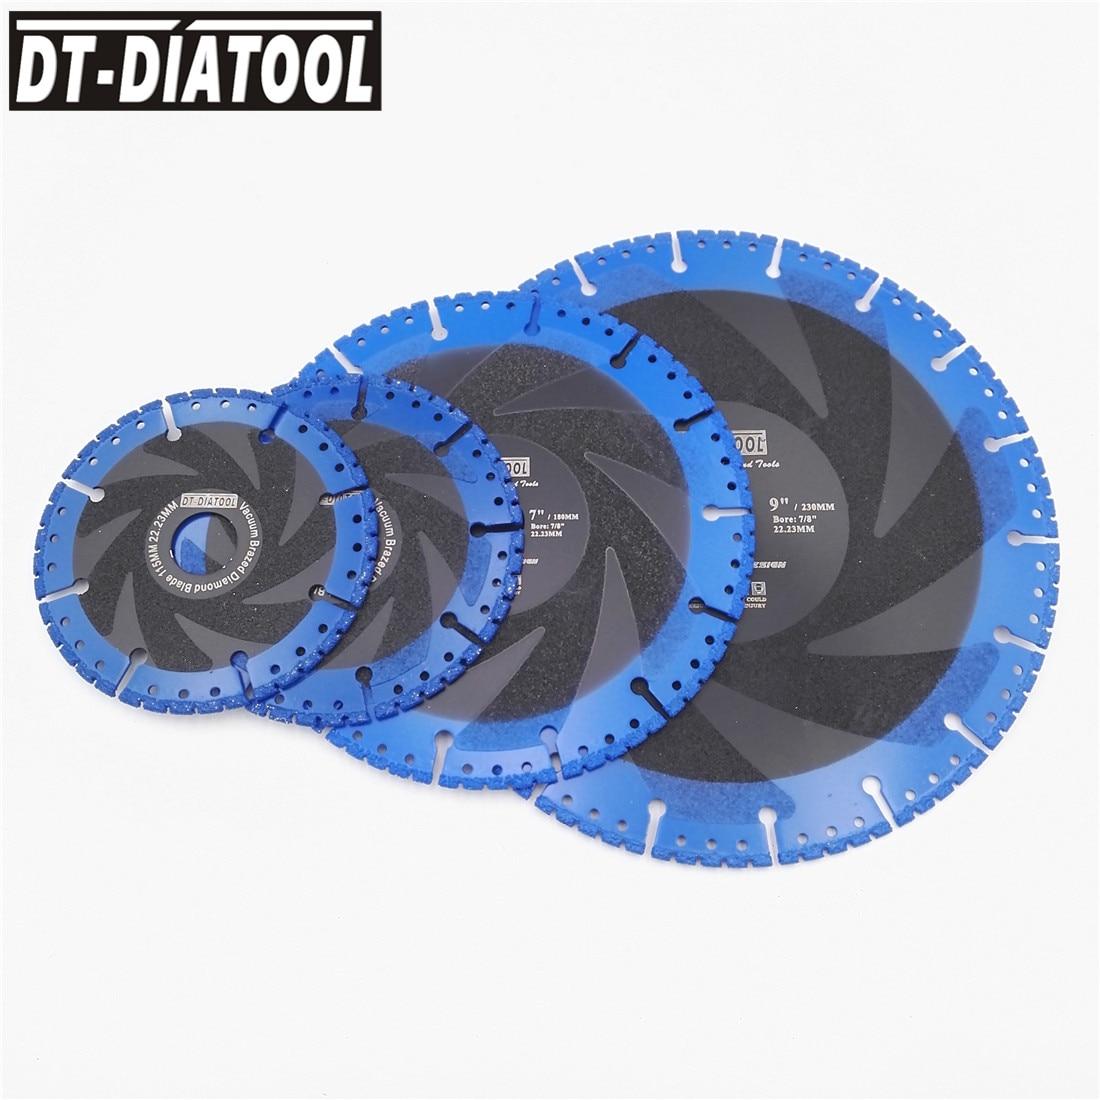 DT-DIATOOL Vacuum Brazed Diamond Demolition Saw Blade Cutting Disc Multi Purpose Rescue Blade For Cast Iron Steel Metal Plastic